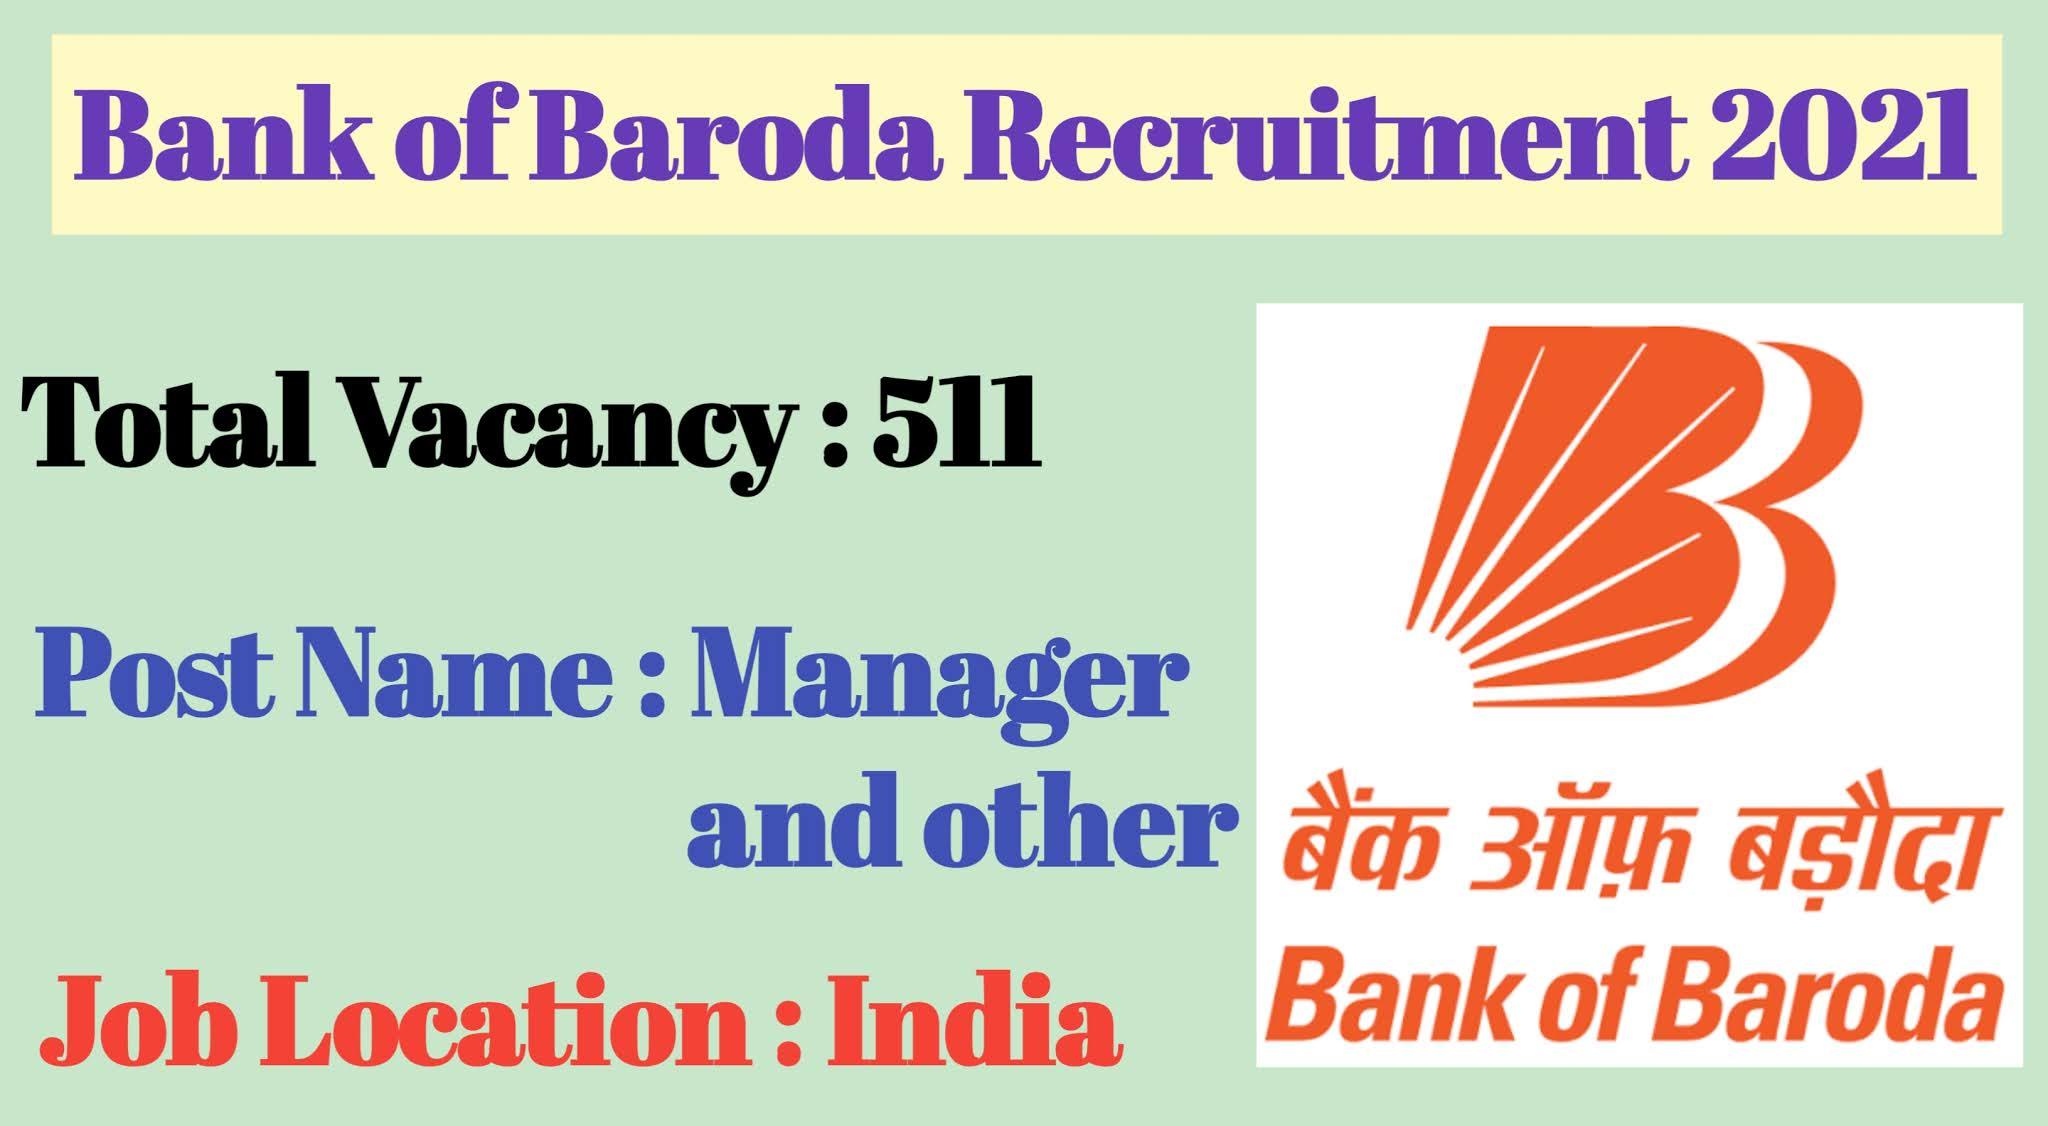 Bank of Baroda Recruitment 2021, BOB Recruitment 2021, BOB 511 Manager and Head post